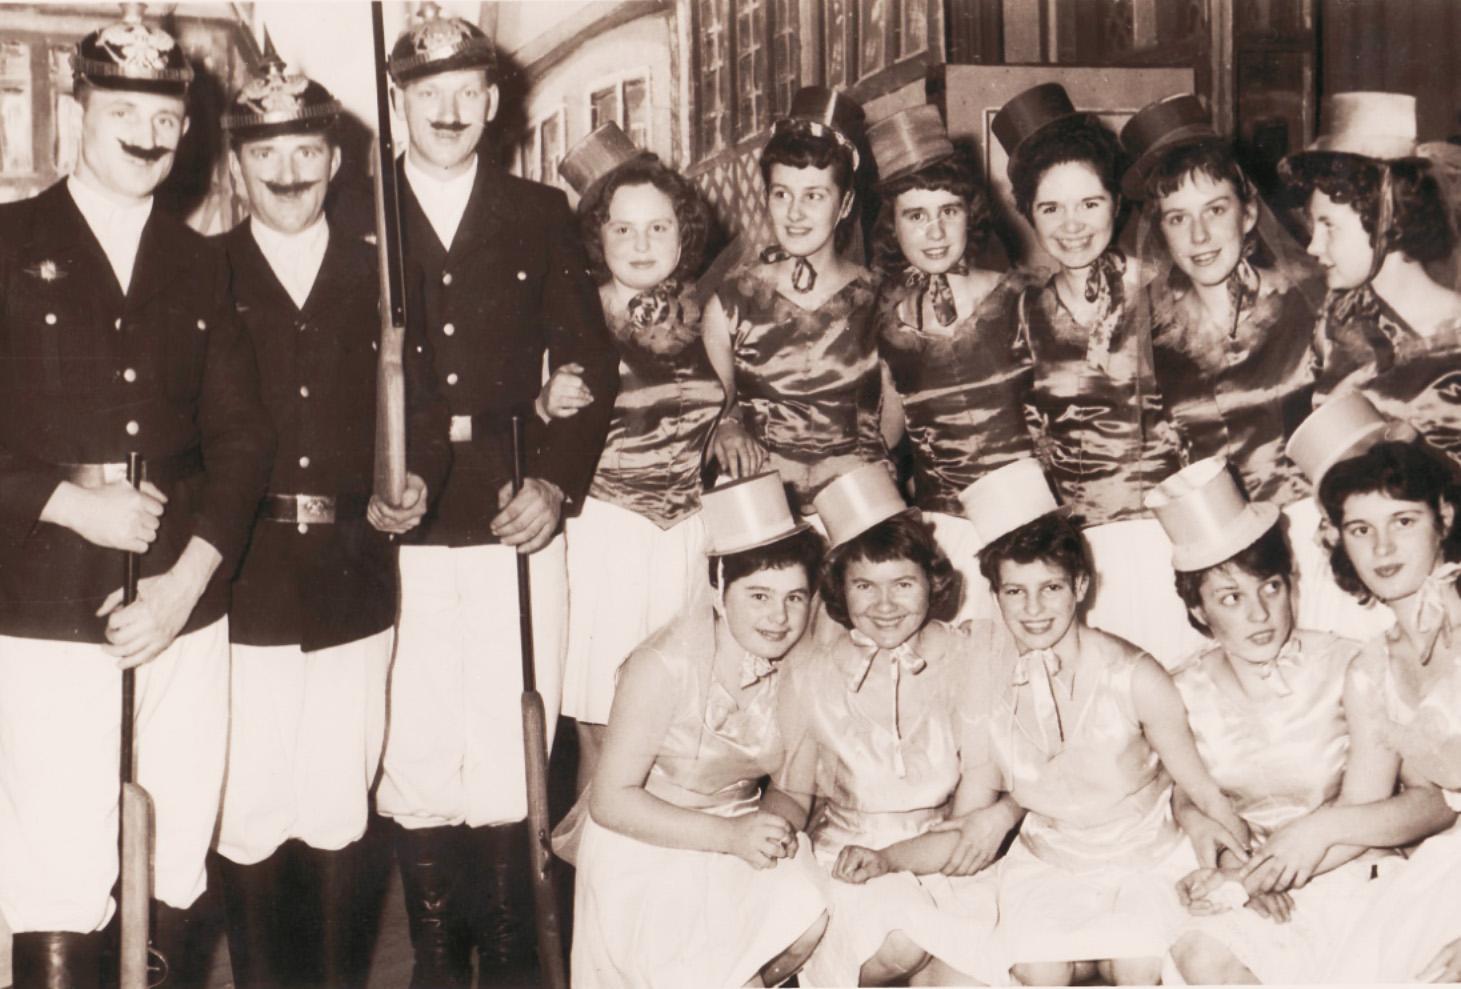 Fasent Chronik des Turnverein Langenbrand 1948